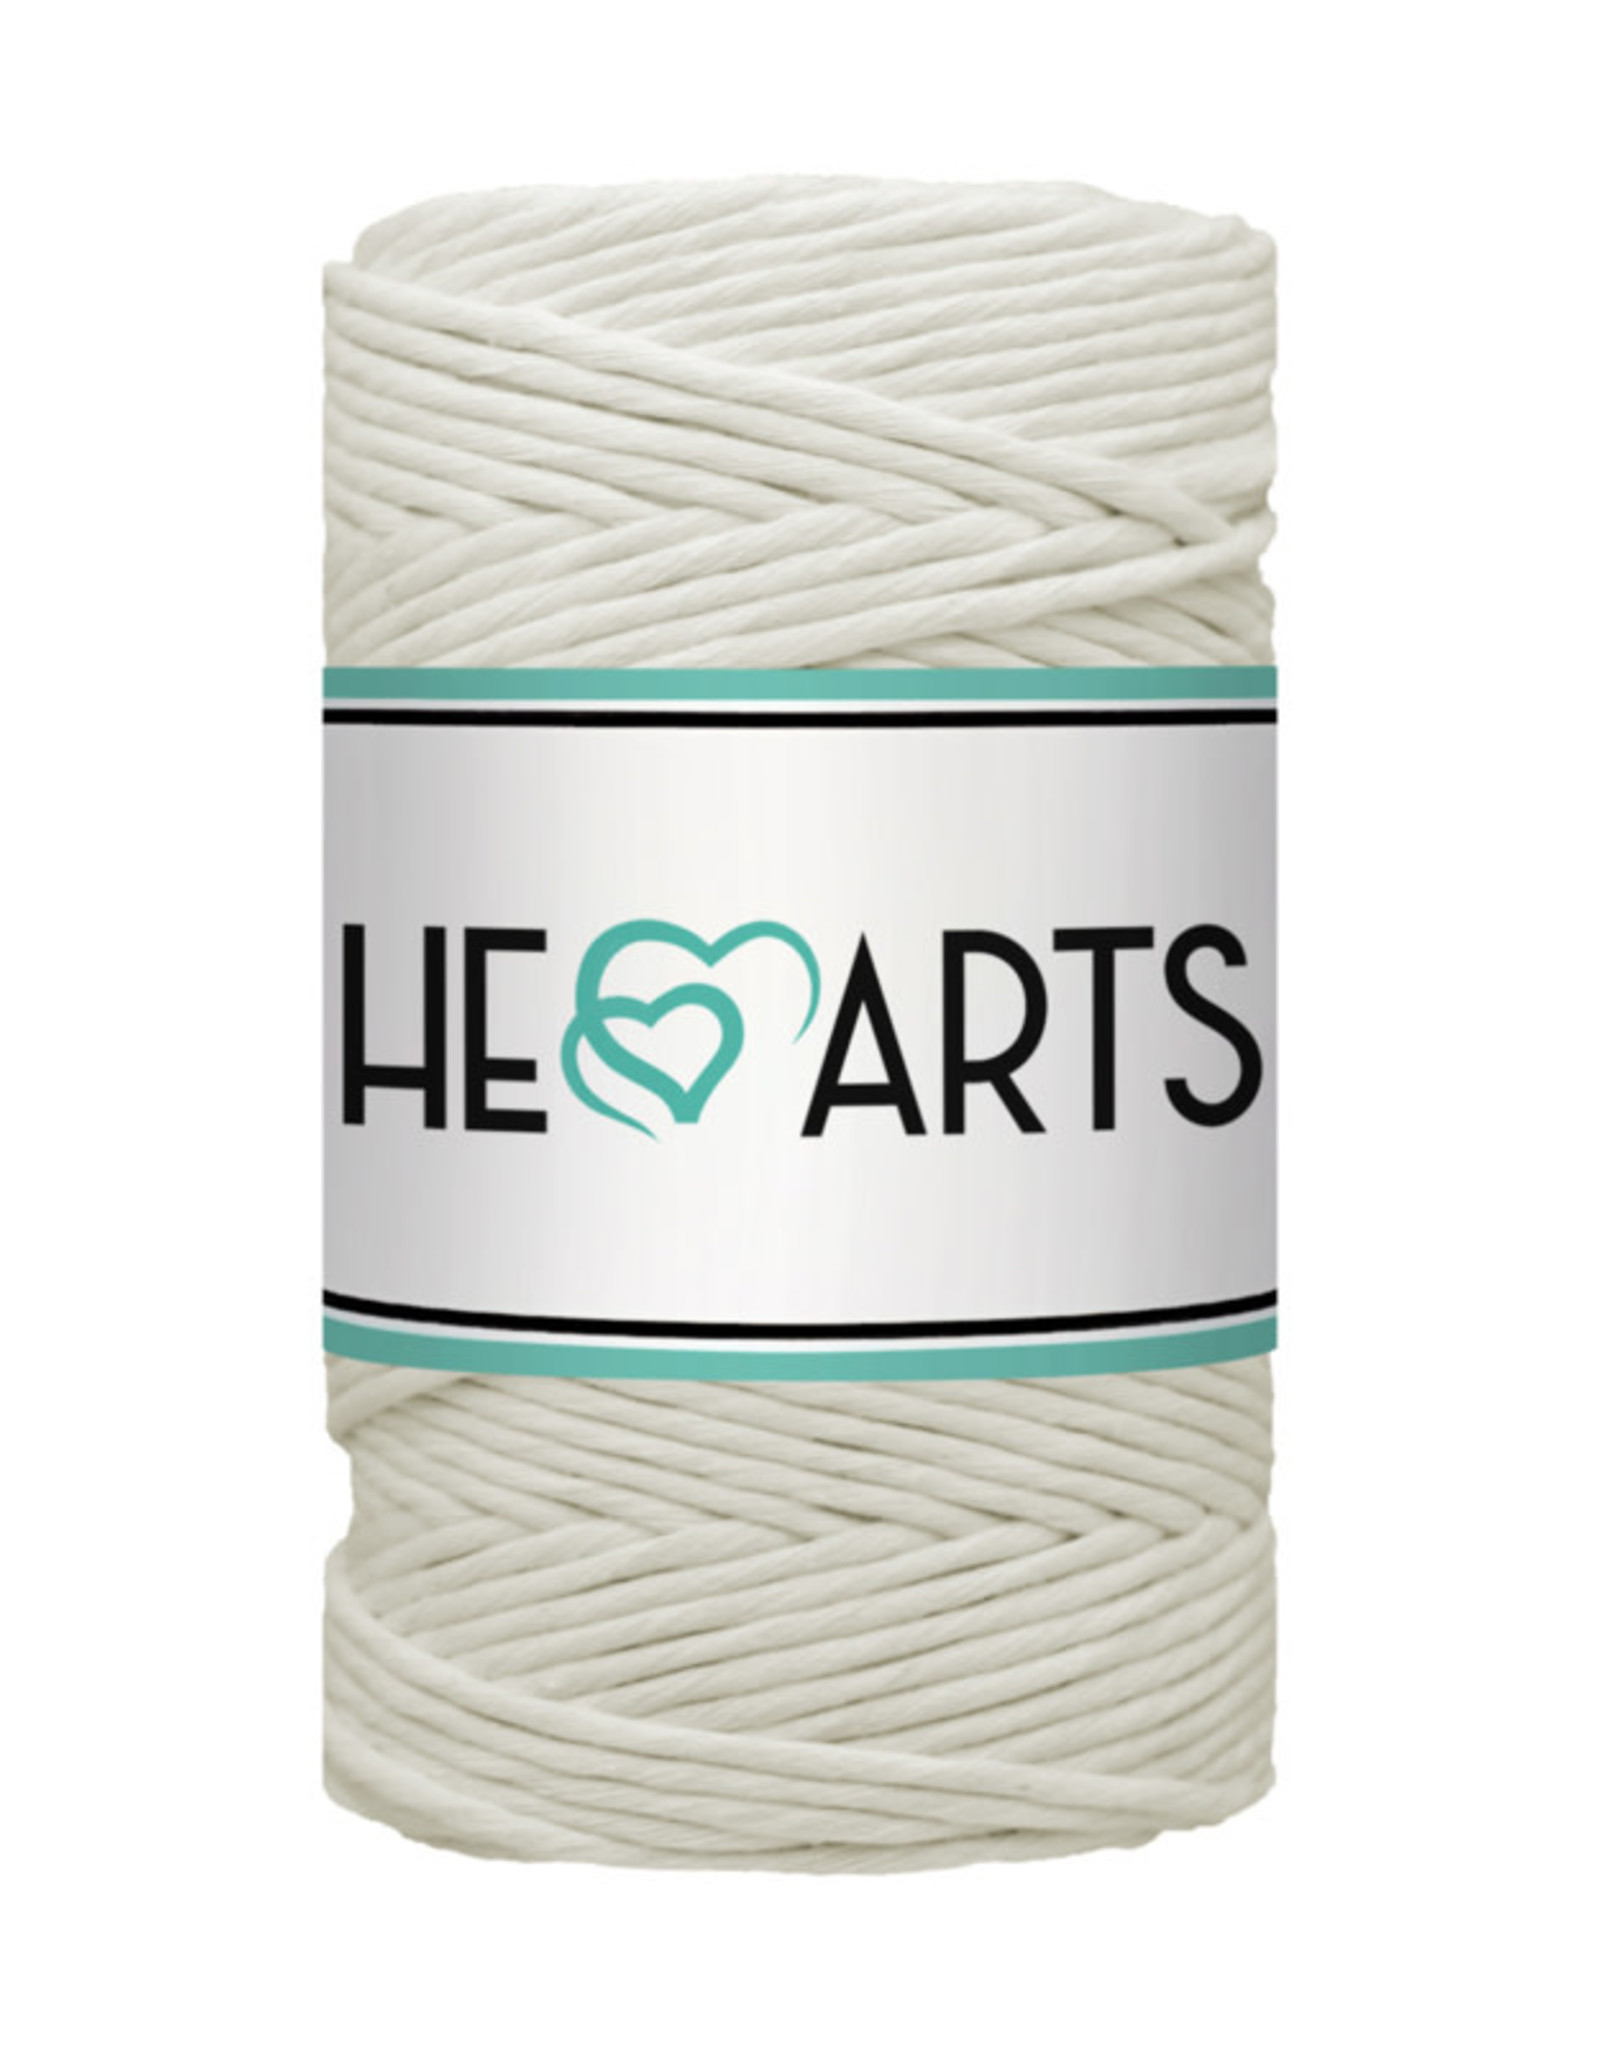 HEARTS HEARTS - Macramé koord single twist - Naturel 3mm